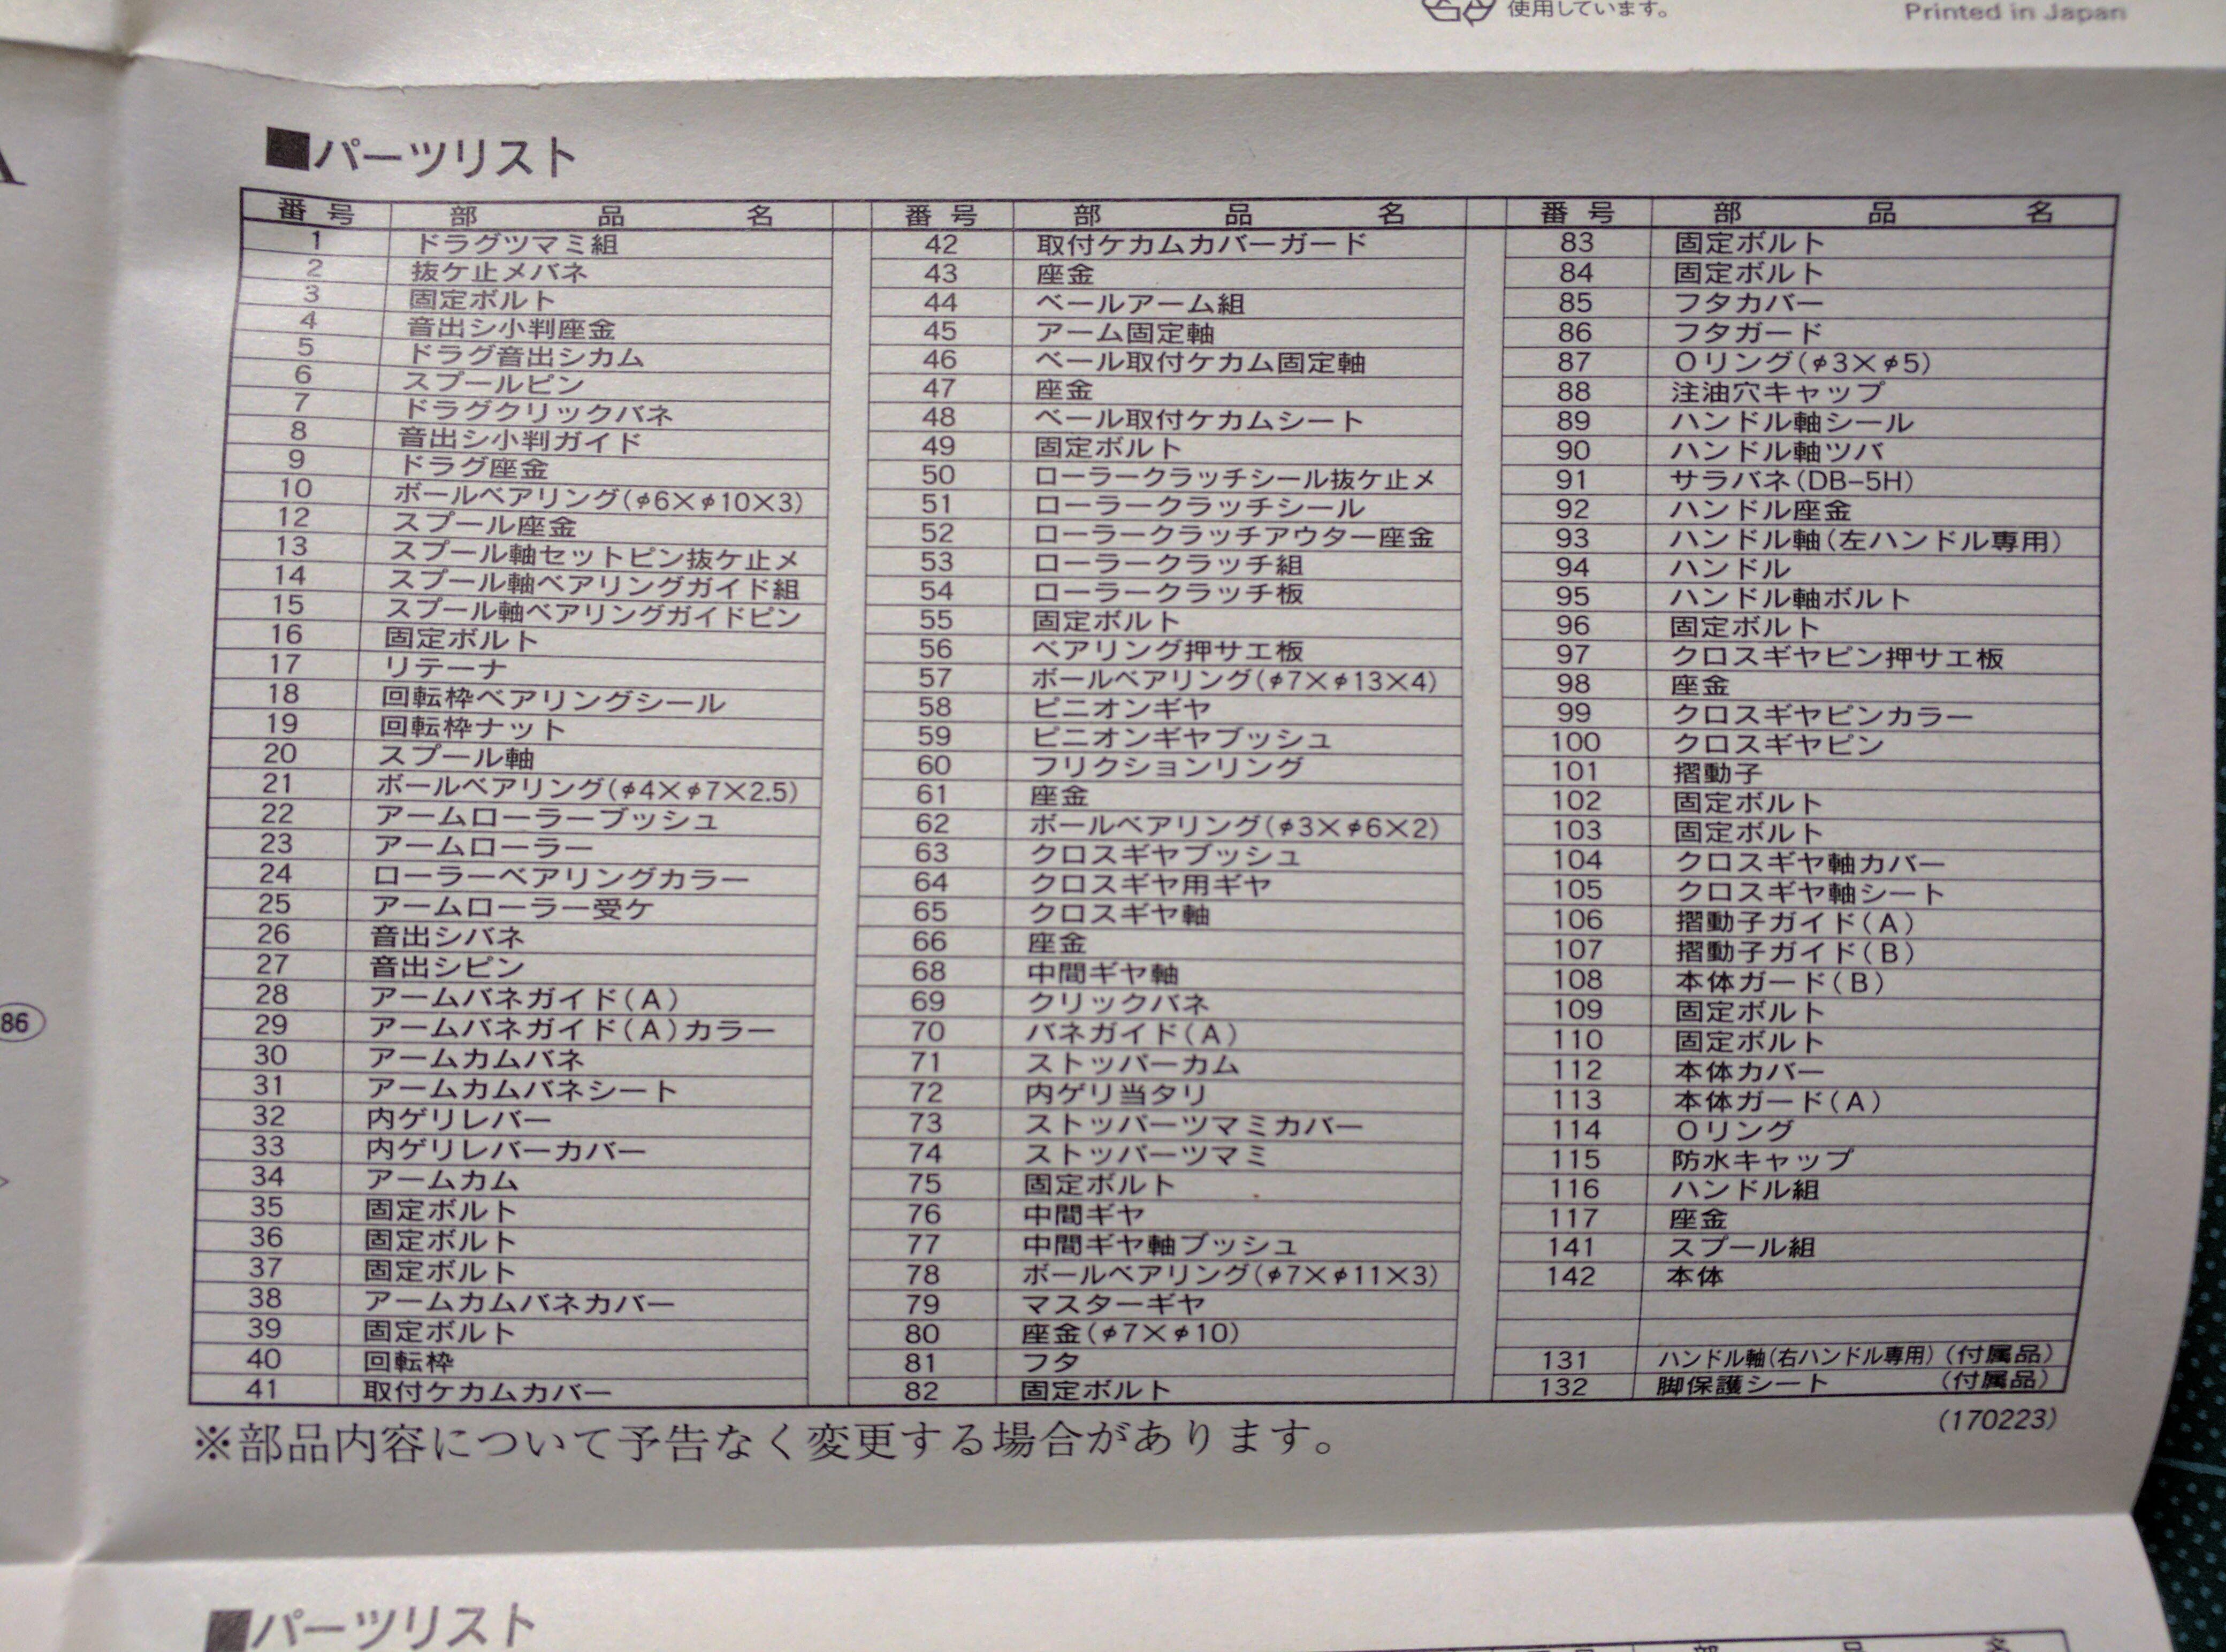 shimano-04stella-1000S-parts-list (107223)